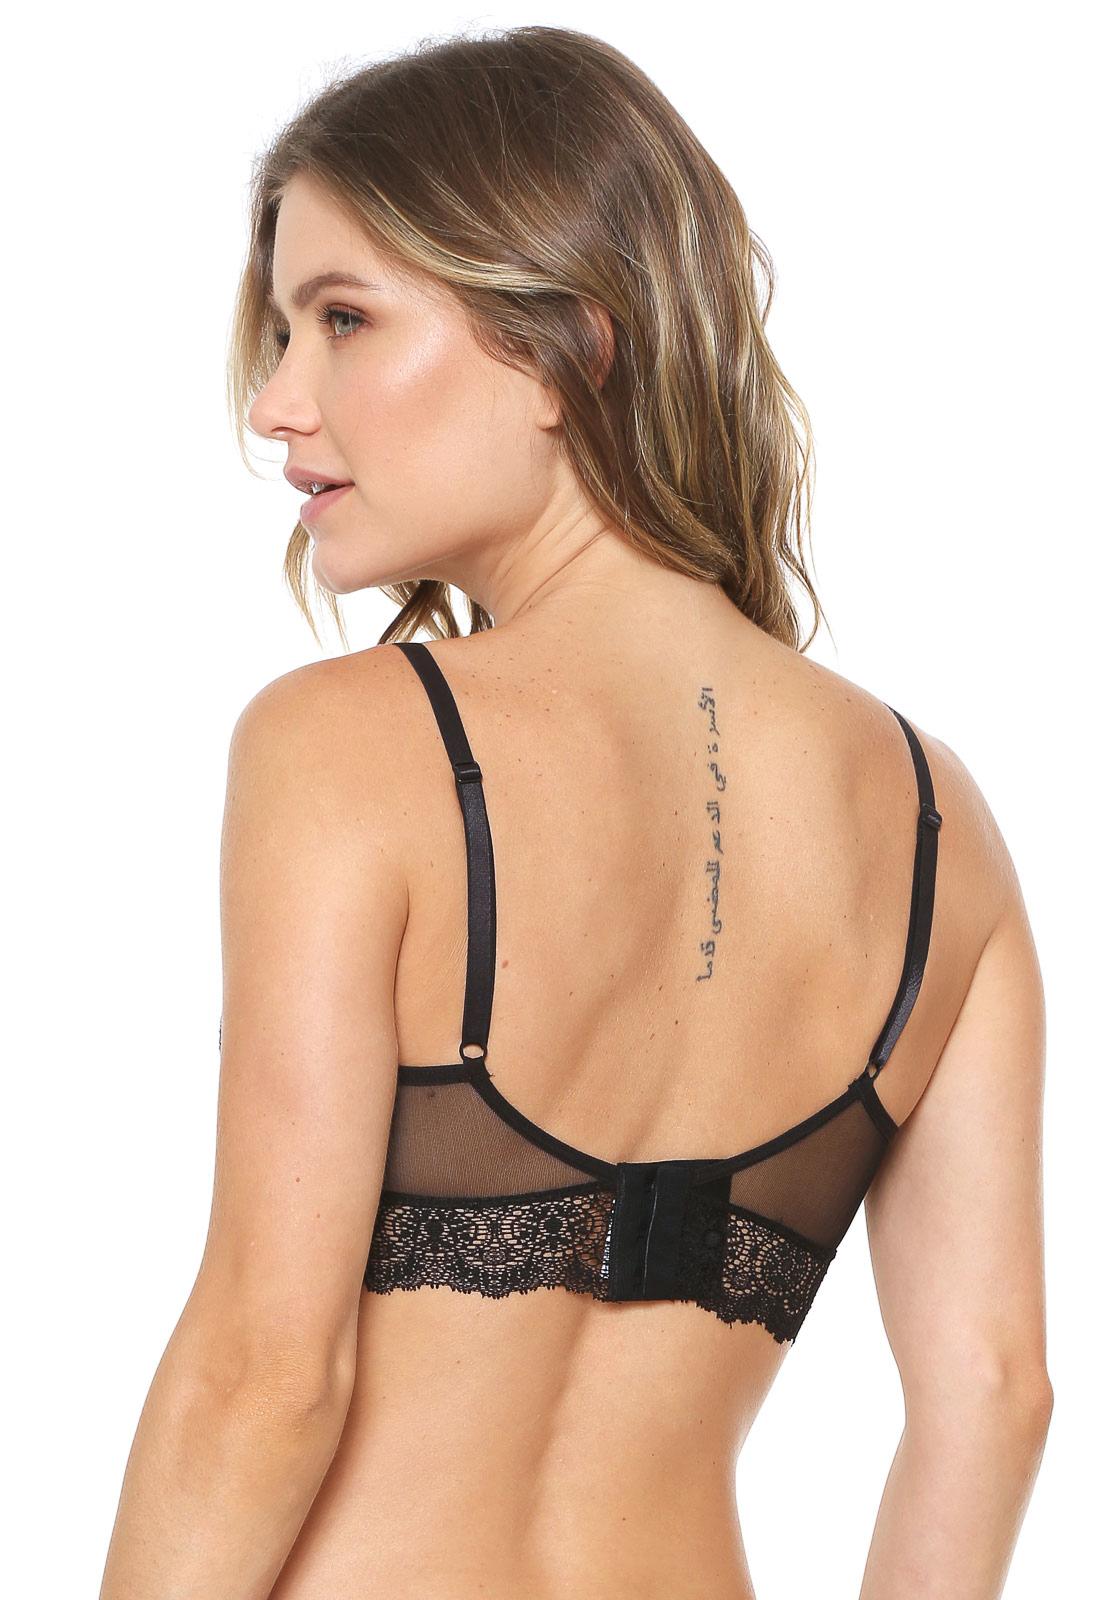 913c1700e Sutiã Calvin Klein Underwear Triângulo Renda Preto em 2019 ...